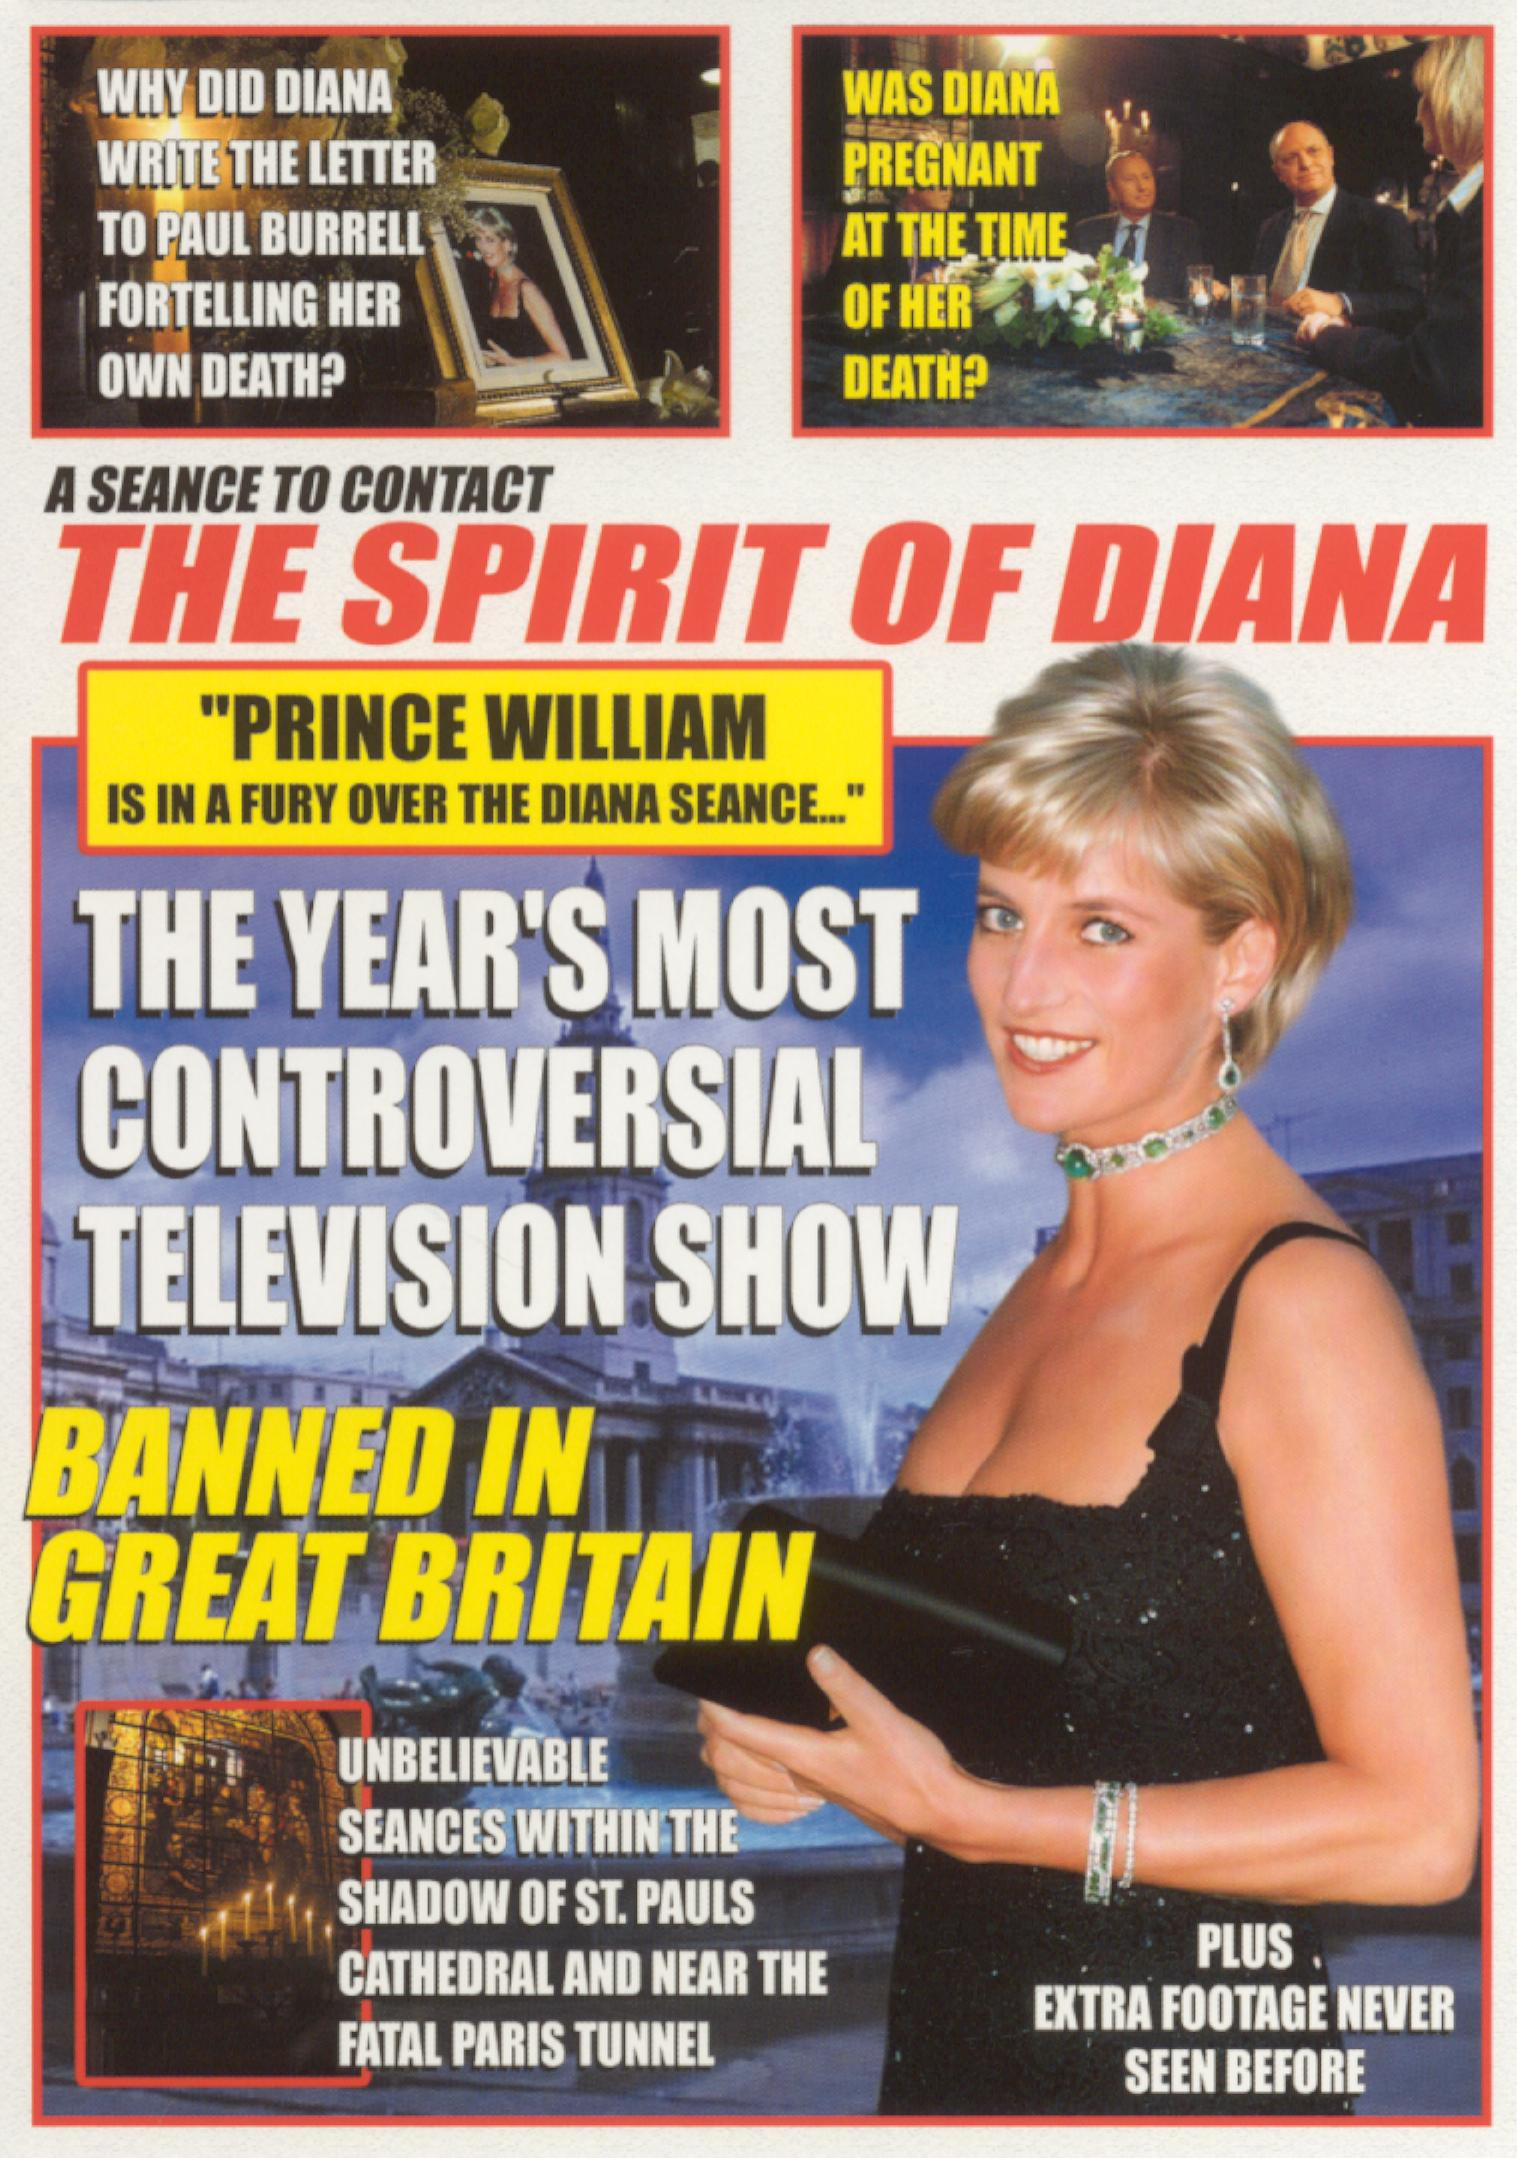 The Spirit of Diana